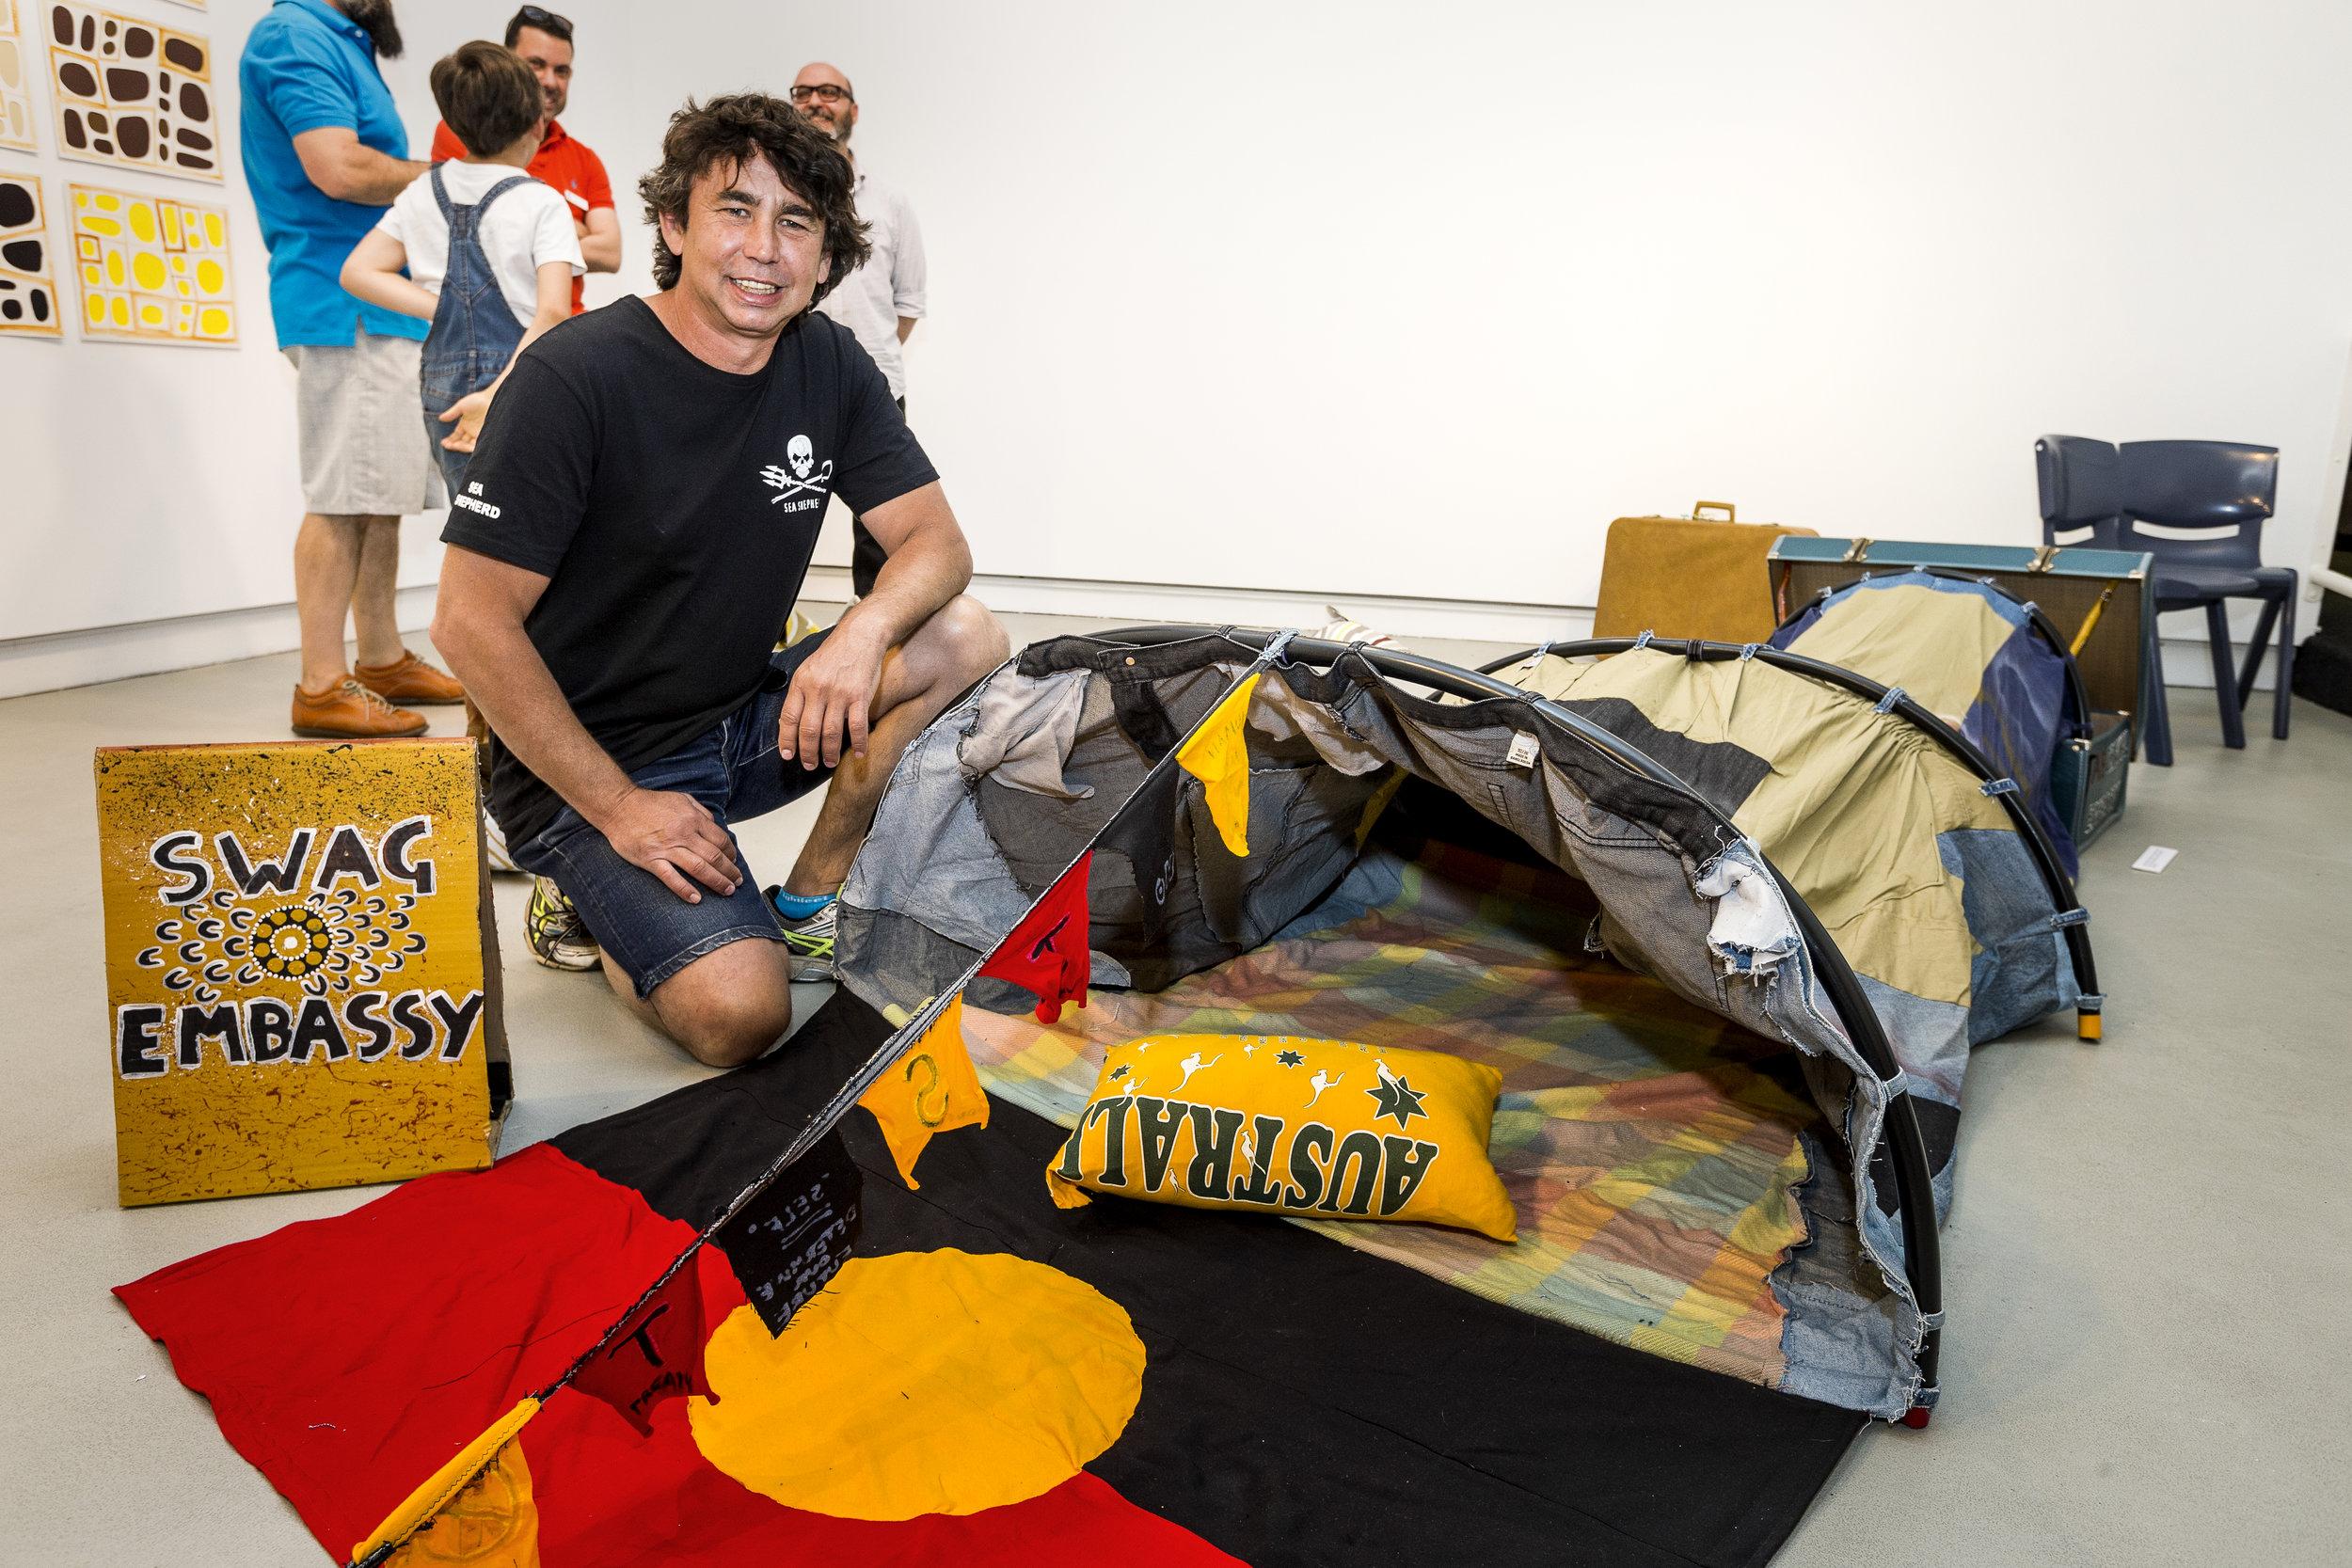 Christopher Burthurmarr Crebbin with his artwork  Swag Embassy , installation view, Prospect Gallery, 2015. Photograph John Nieddu